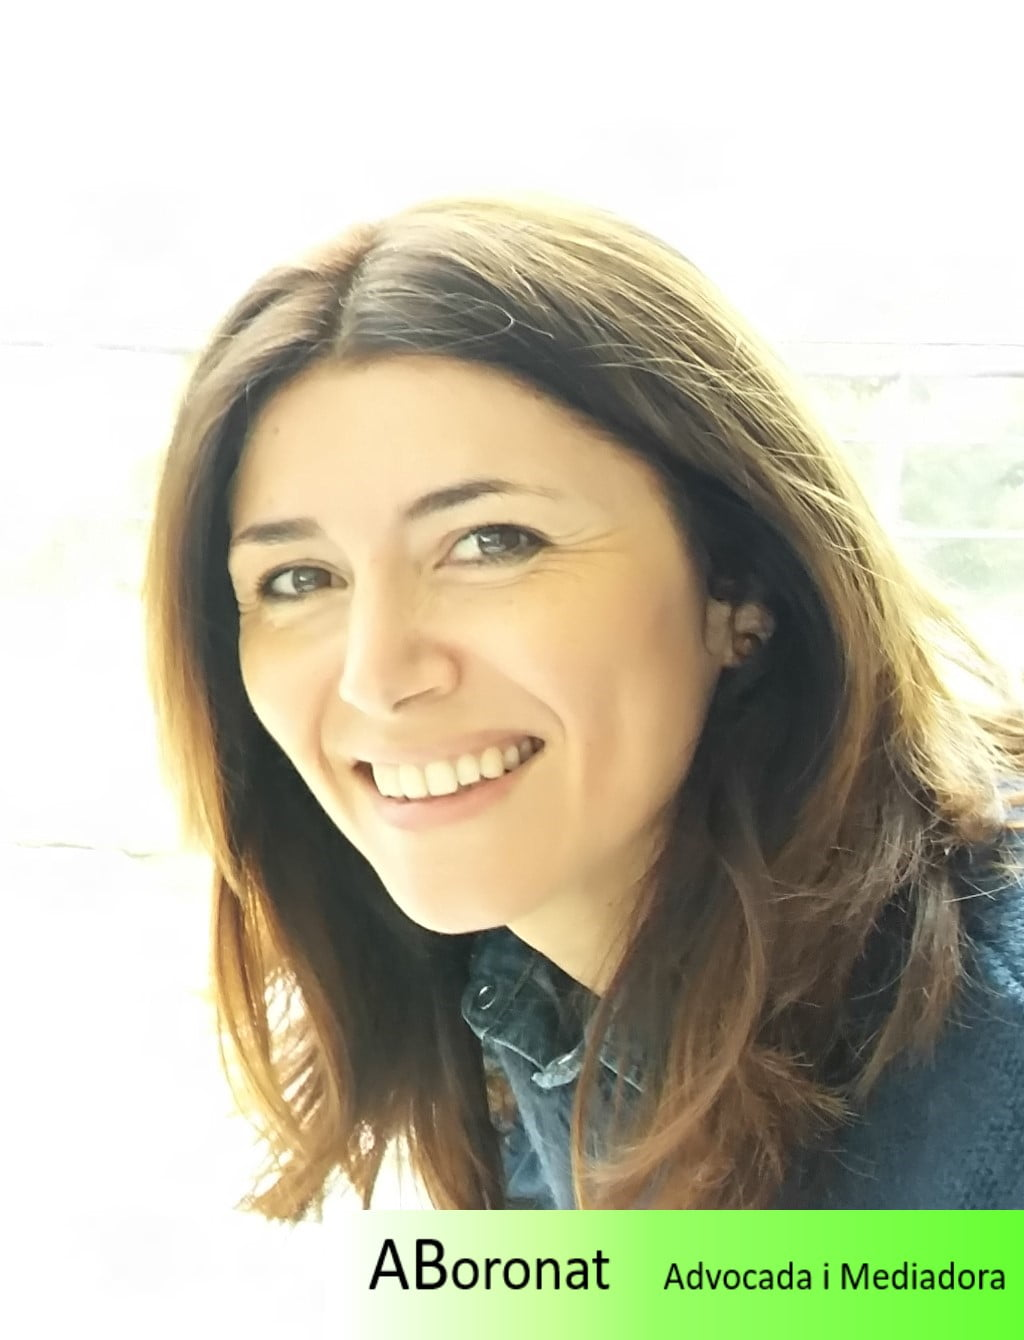 Ana Belén Boronat Gallardo